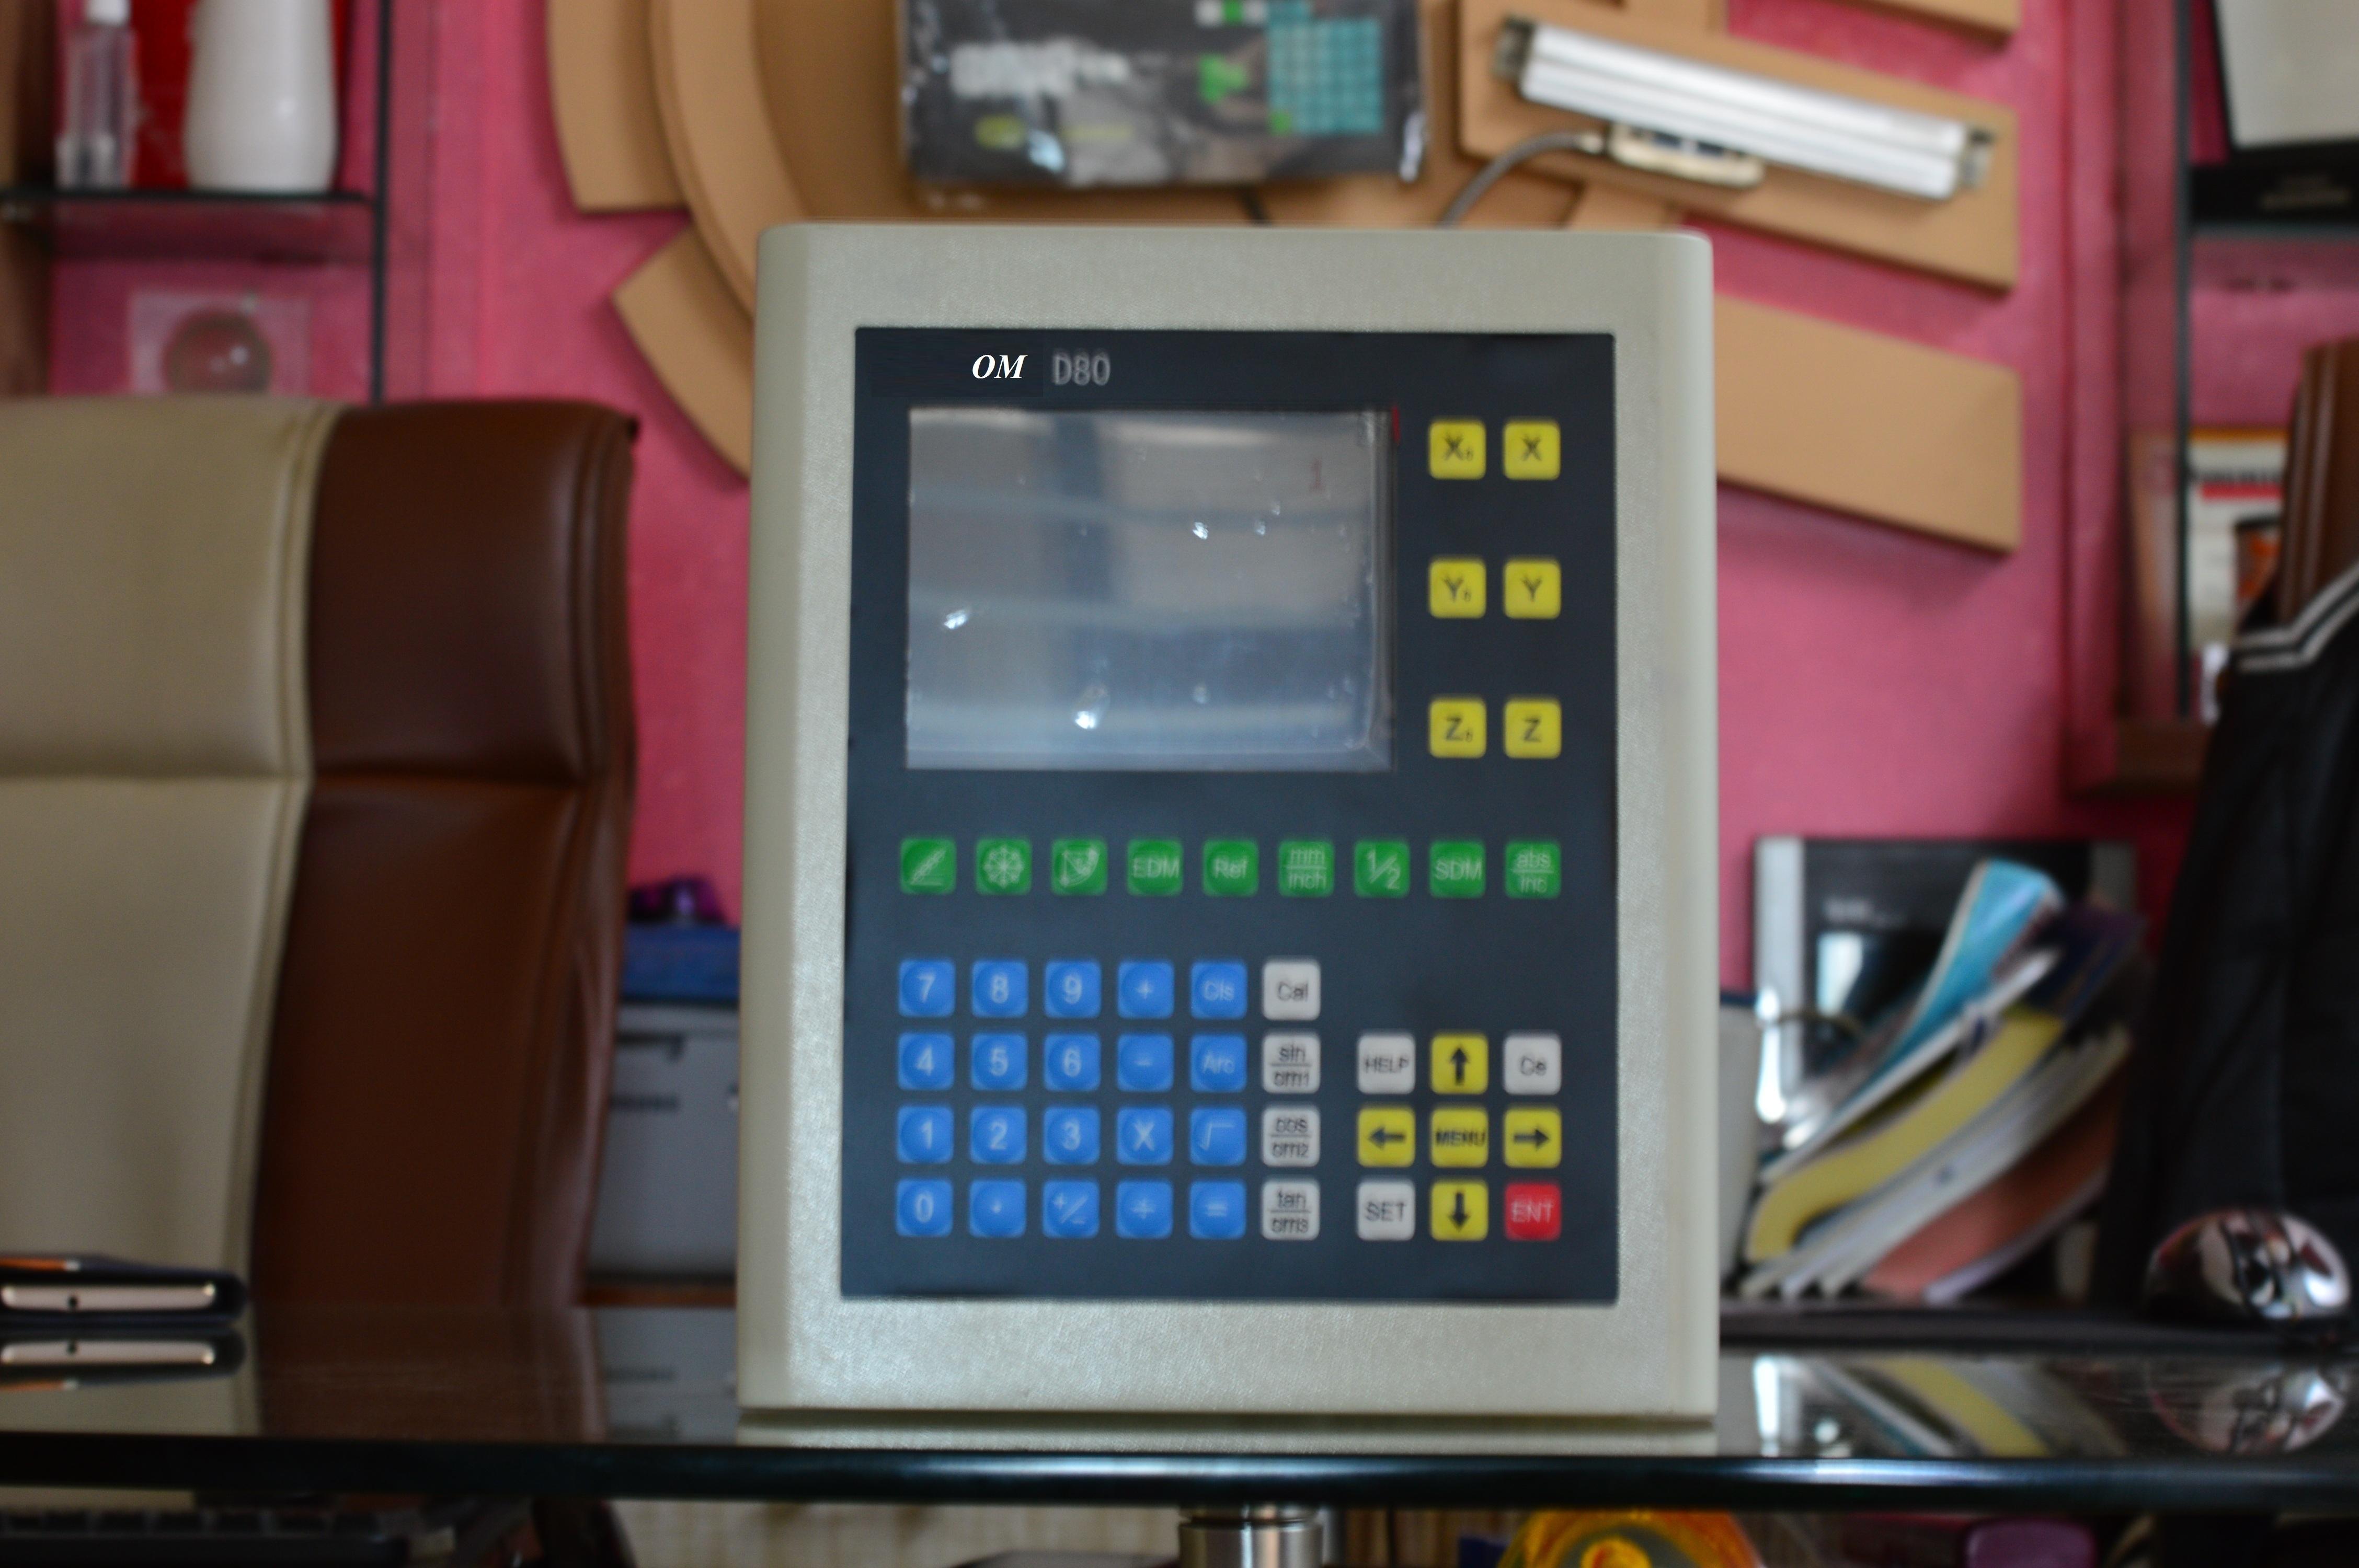 LCD type Digital Readout (DRO)